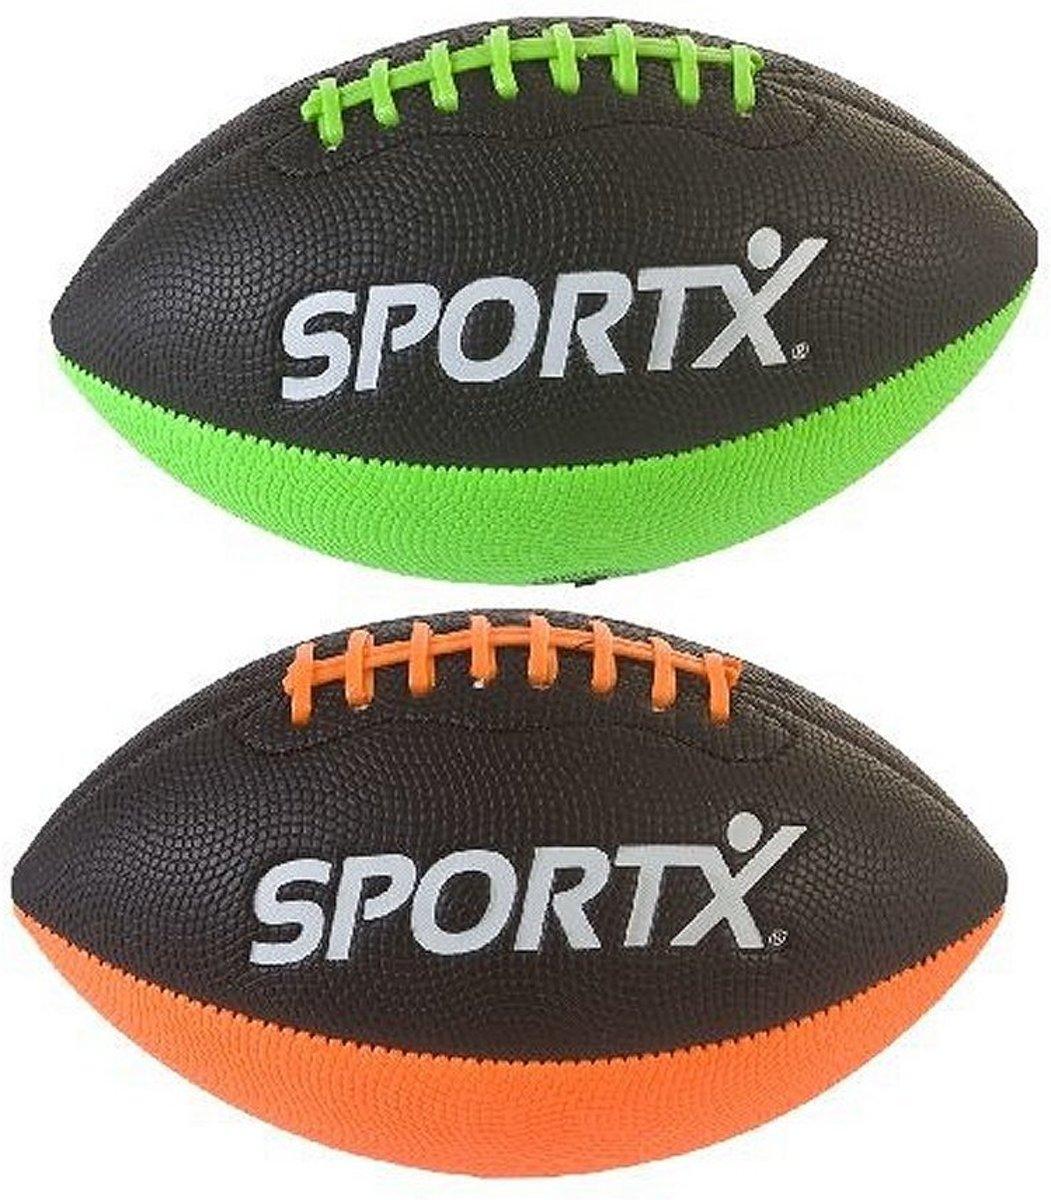 SportX Rugbybal Neon 160-170gr kopen